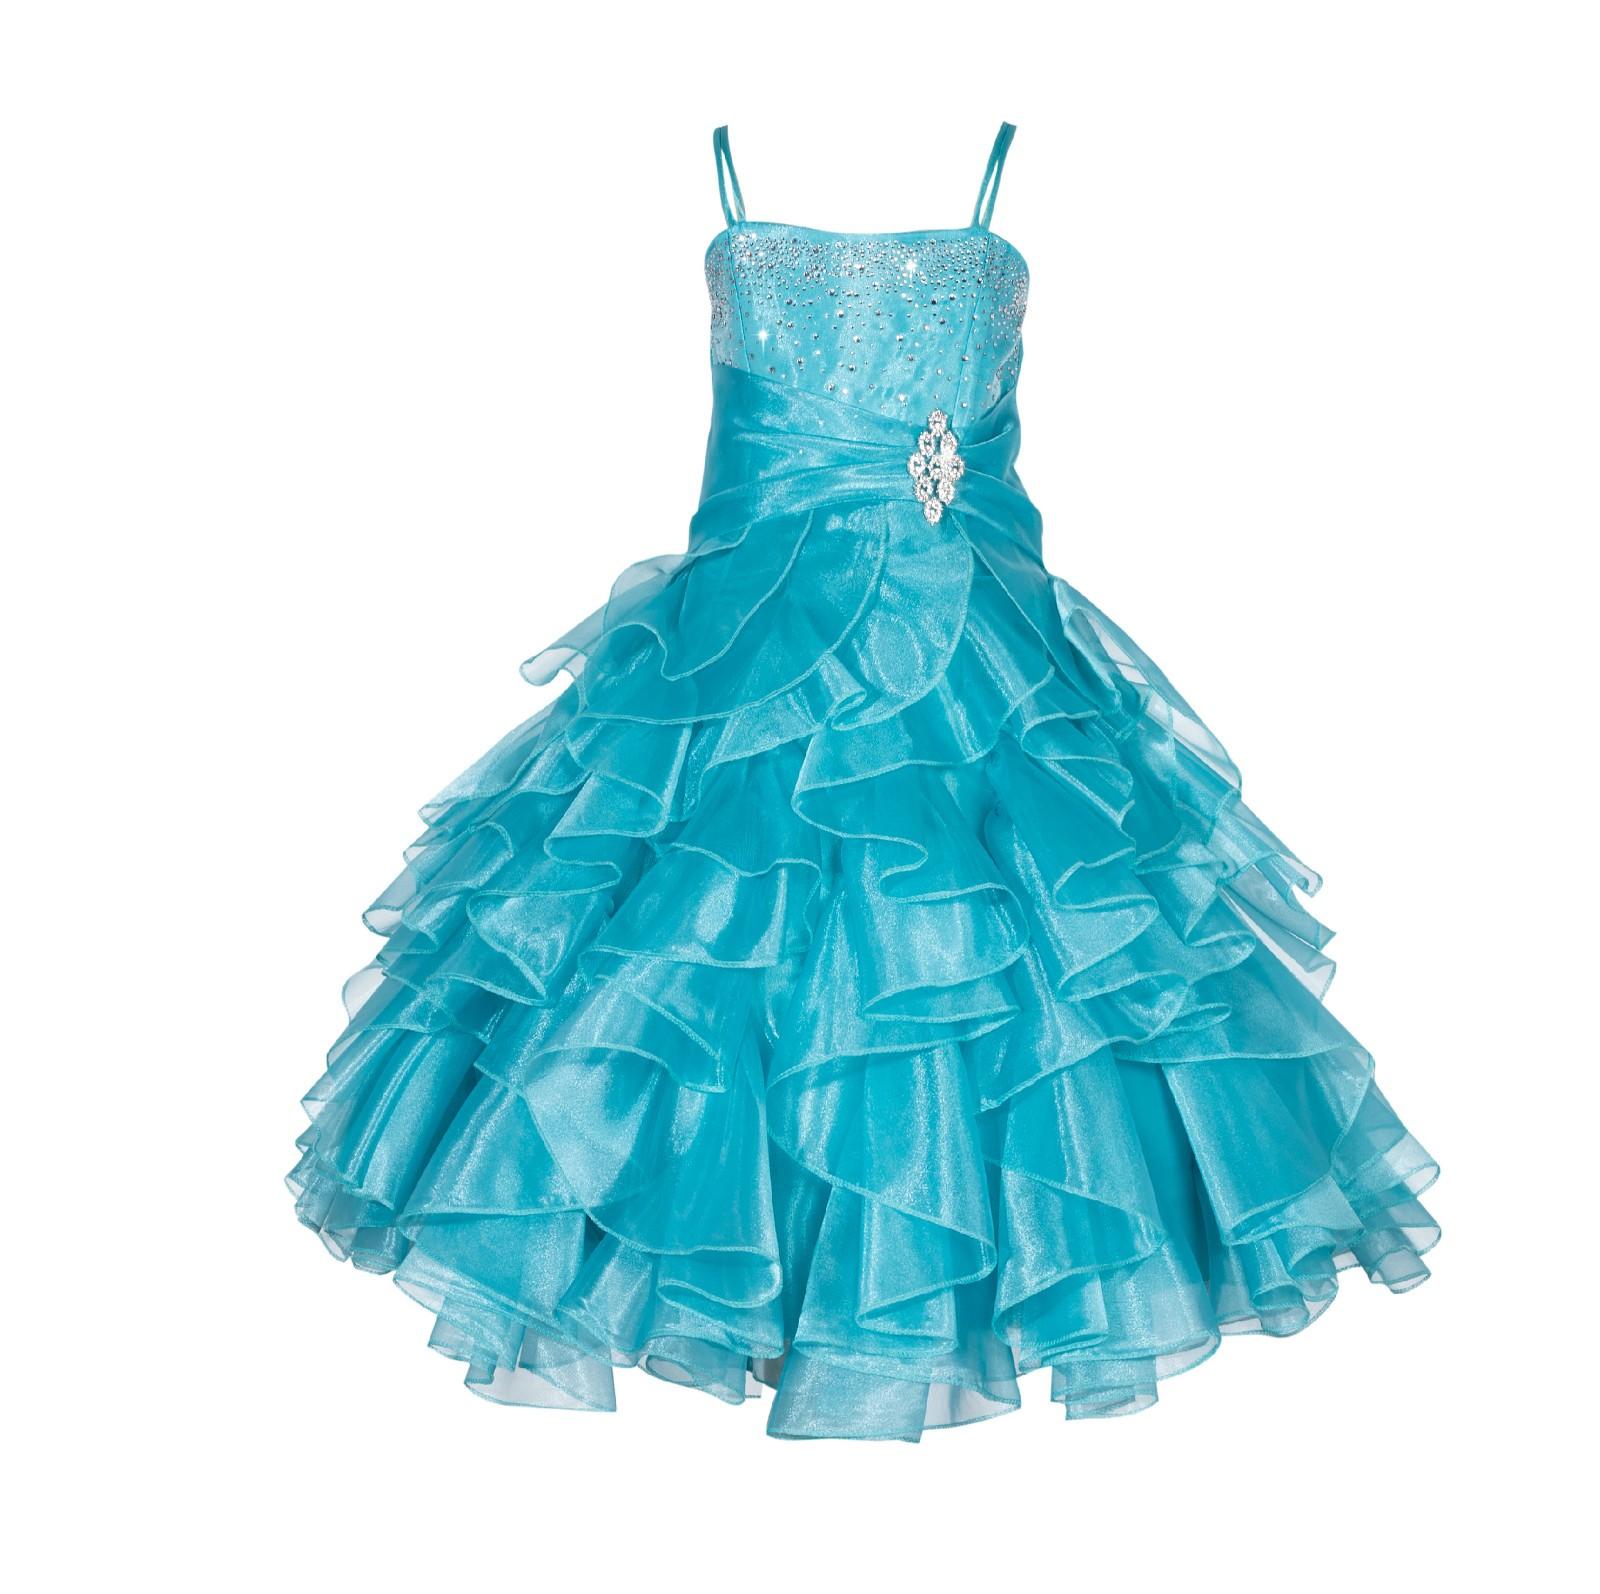 Tiffany Rhinestone Organza Layers Flower Girl Dress Elegant Stunning 164S